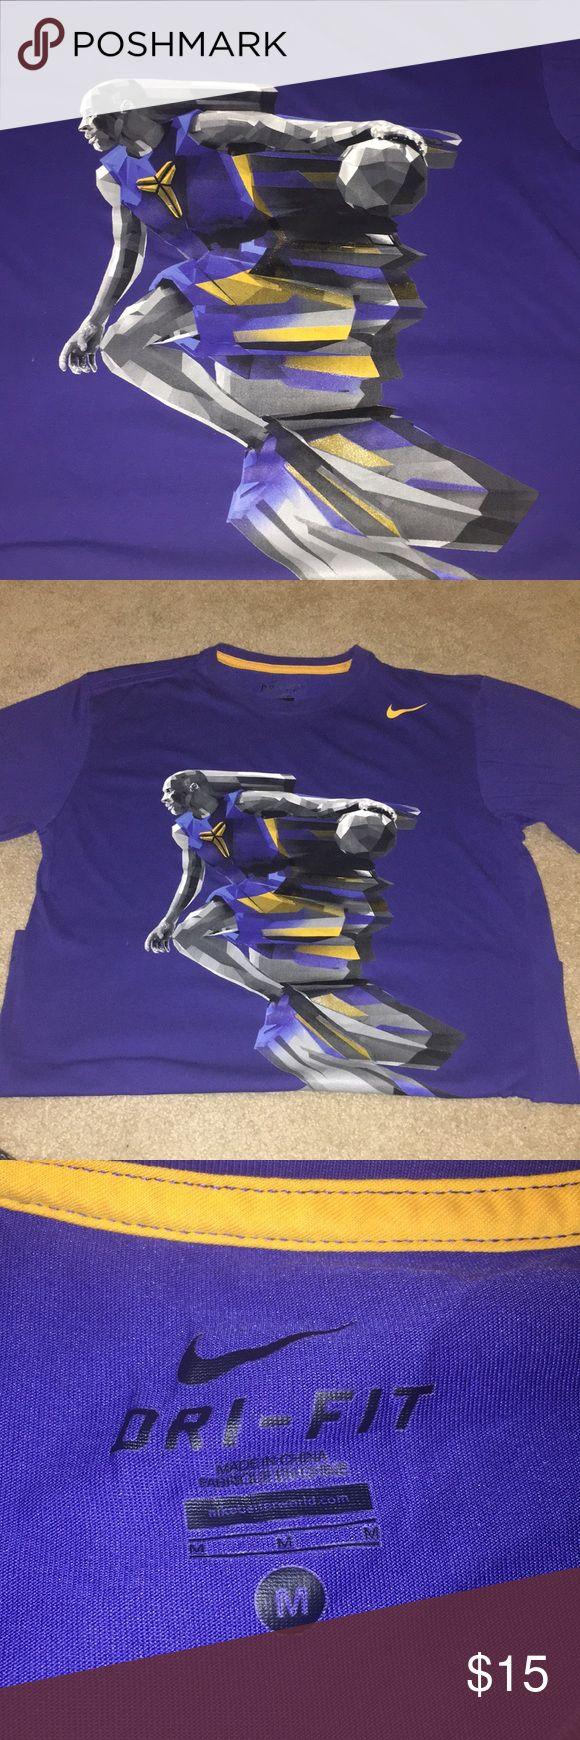 Nike Men's Kobe Bryant's Tee Dri fit Nike Tee Kobe Bryant . Purple gold and size med . Good condition Nike Shirts Tees - Short Sleeve